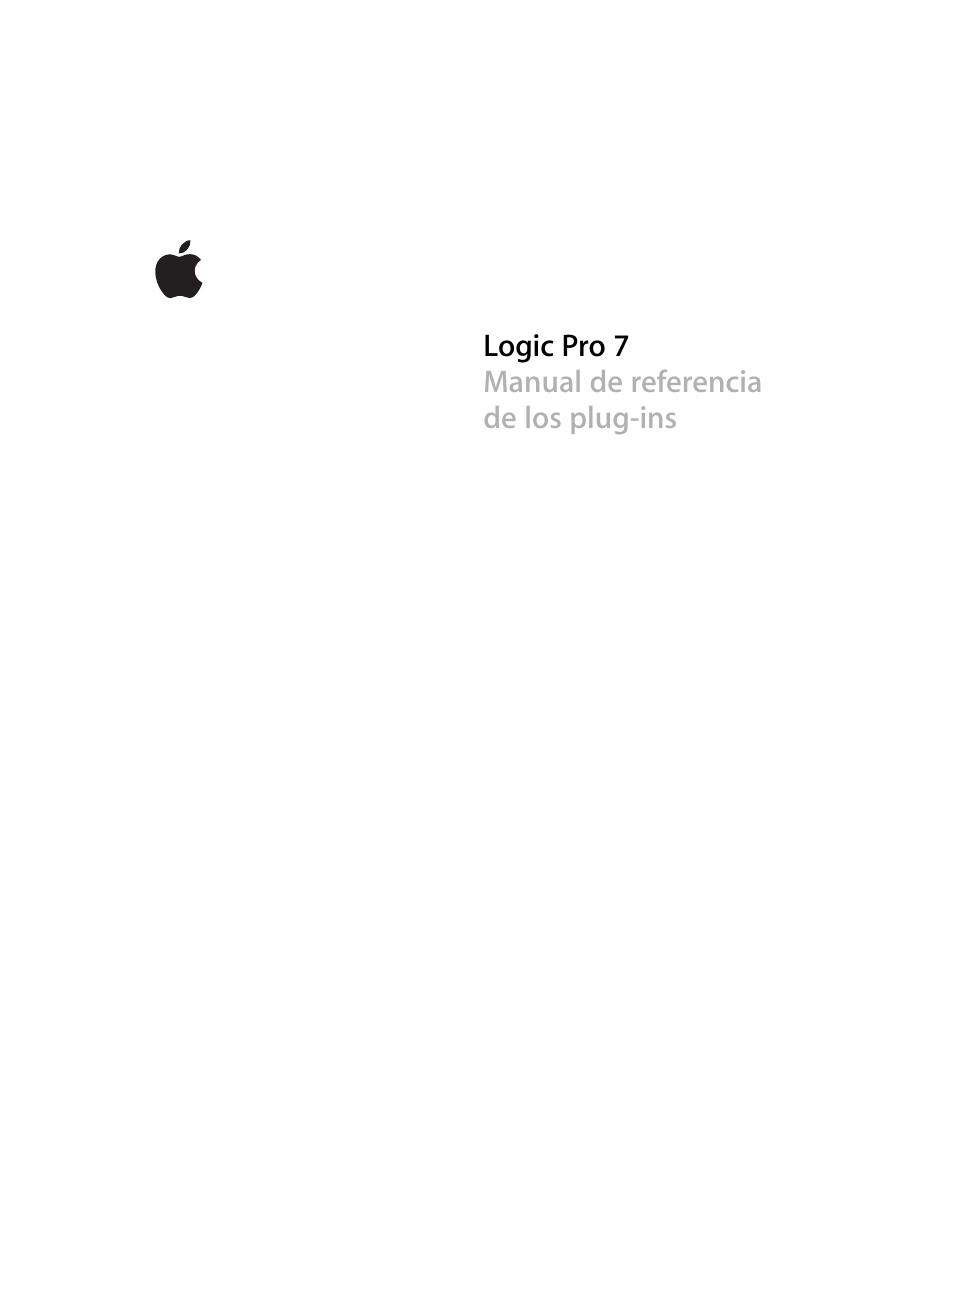 apple logic express 7 manual del usuario p ginas 642 rh pdfmanuales com logic express 7 manual Logic for PC Express